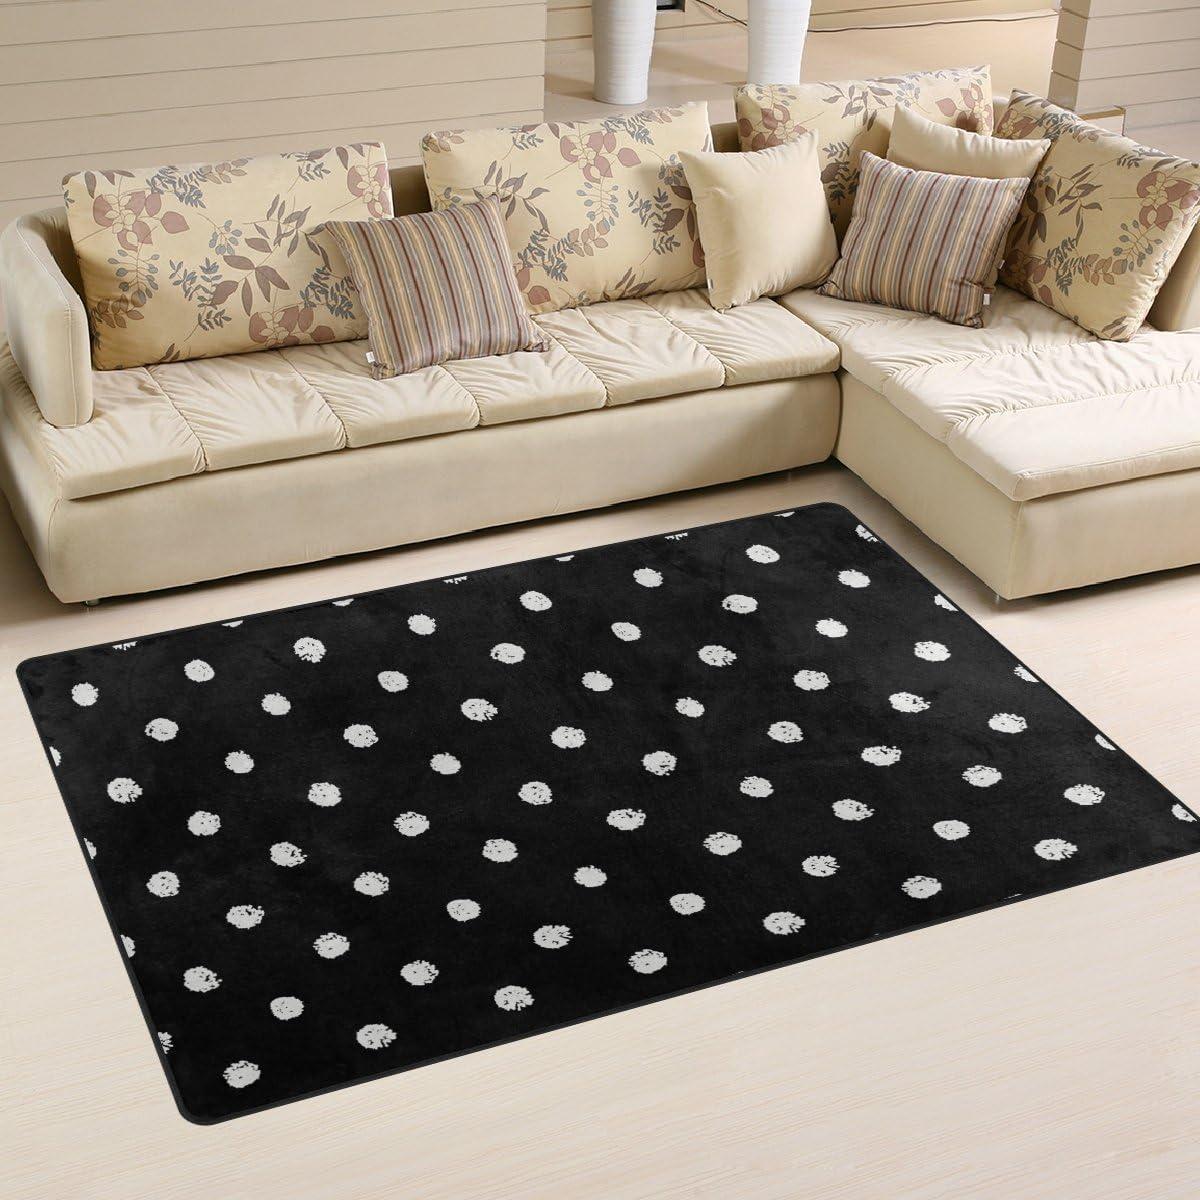 Yochoice Non-slip Area Rugs Home Decor